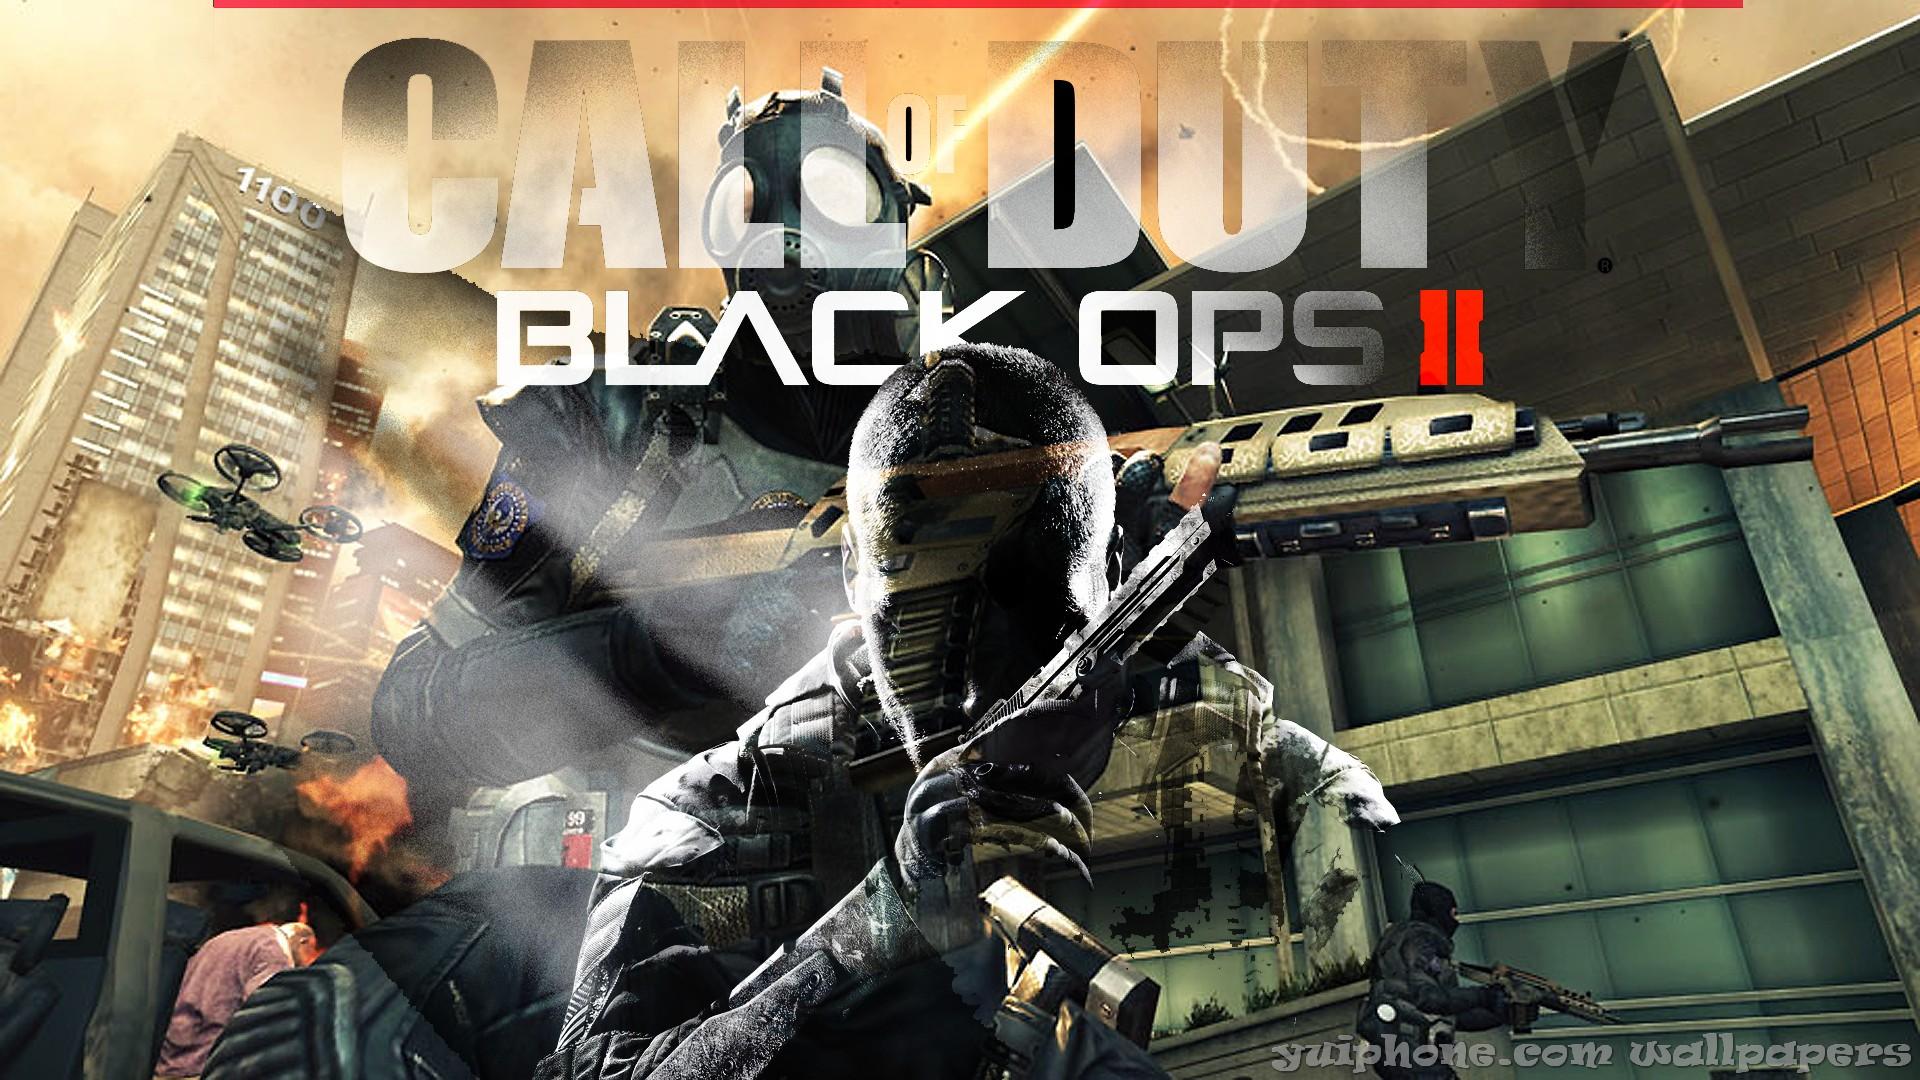 Black Ops Zombies Wallpaper Pblack Ops Hd Wallpapers P Black Ops Ii 1920x1080